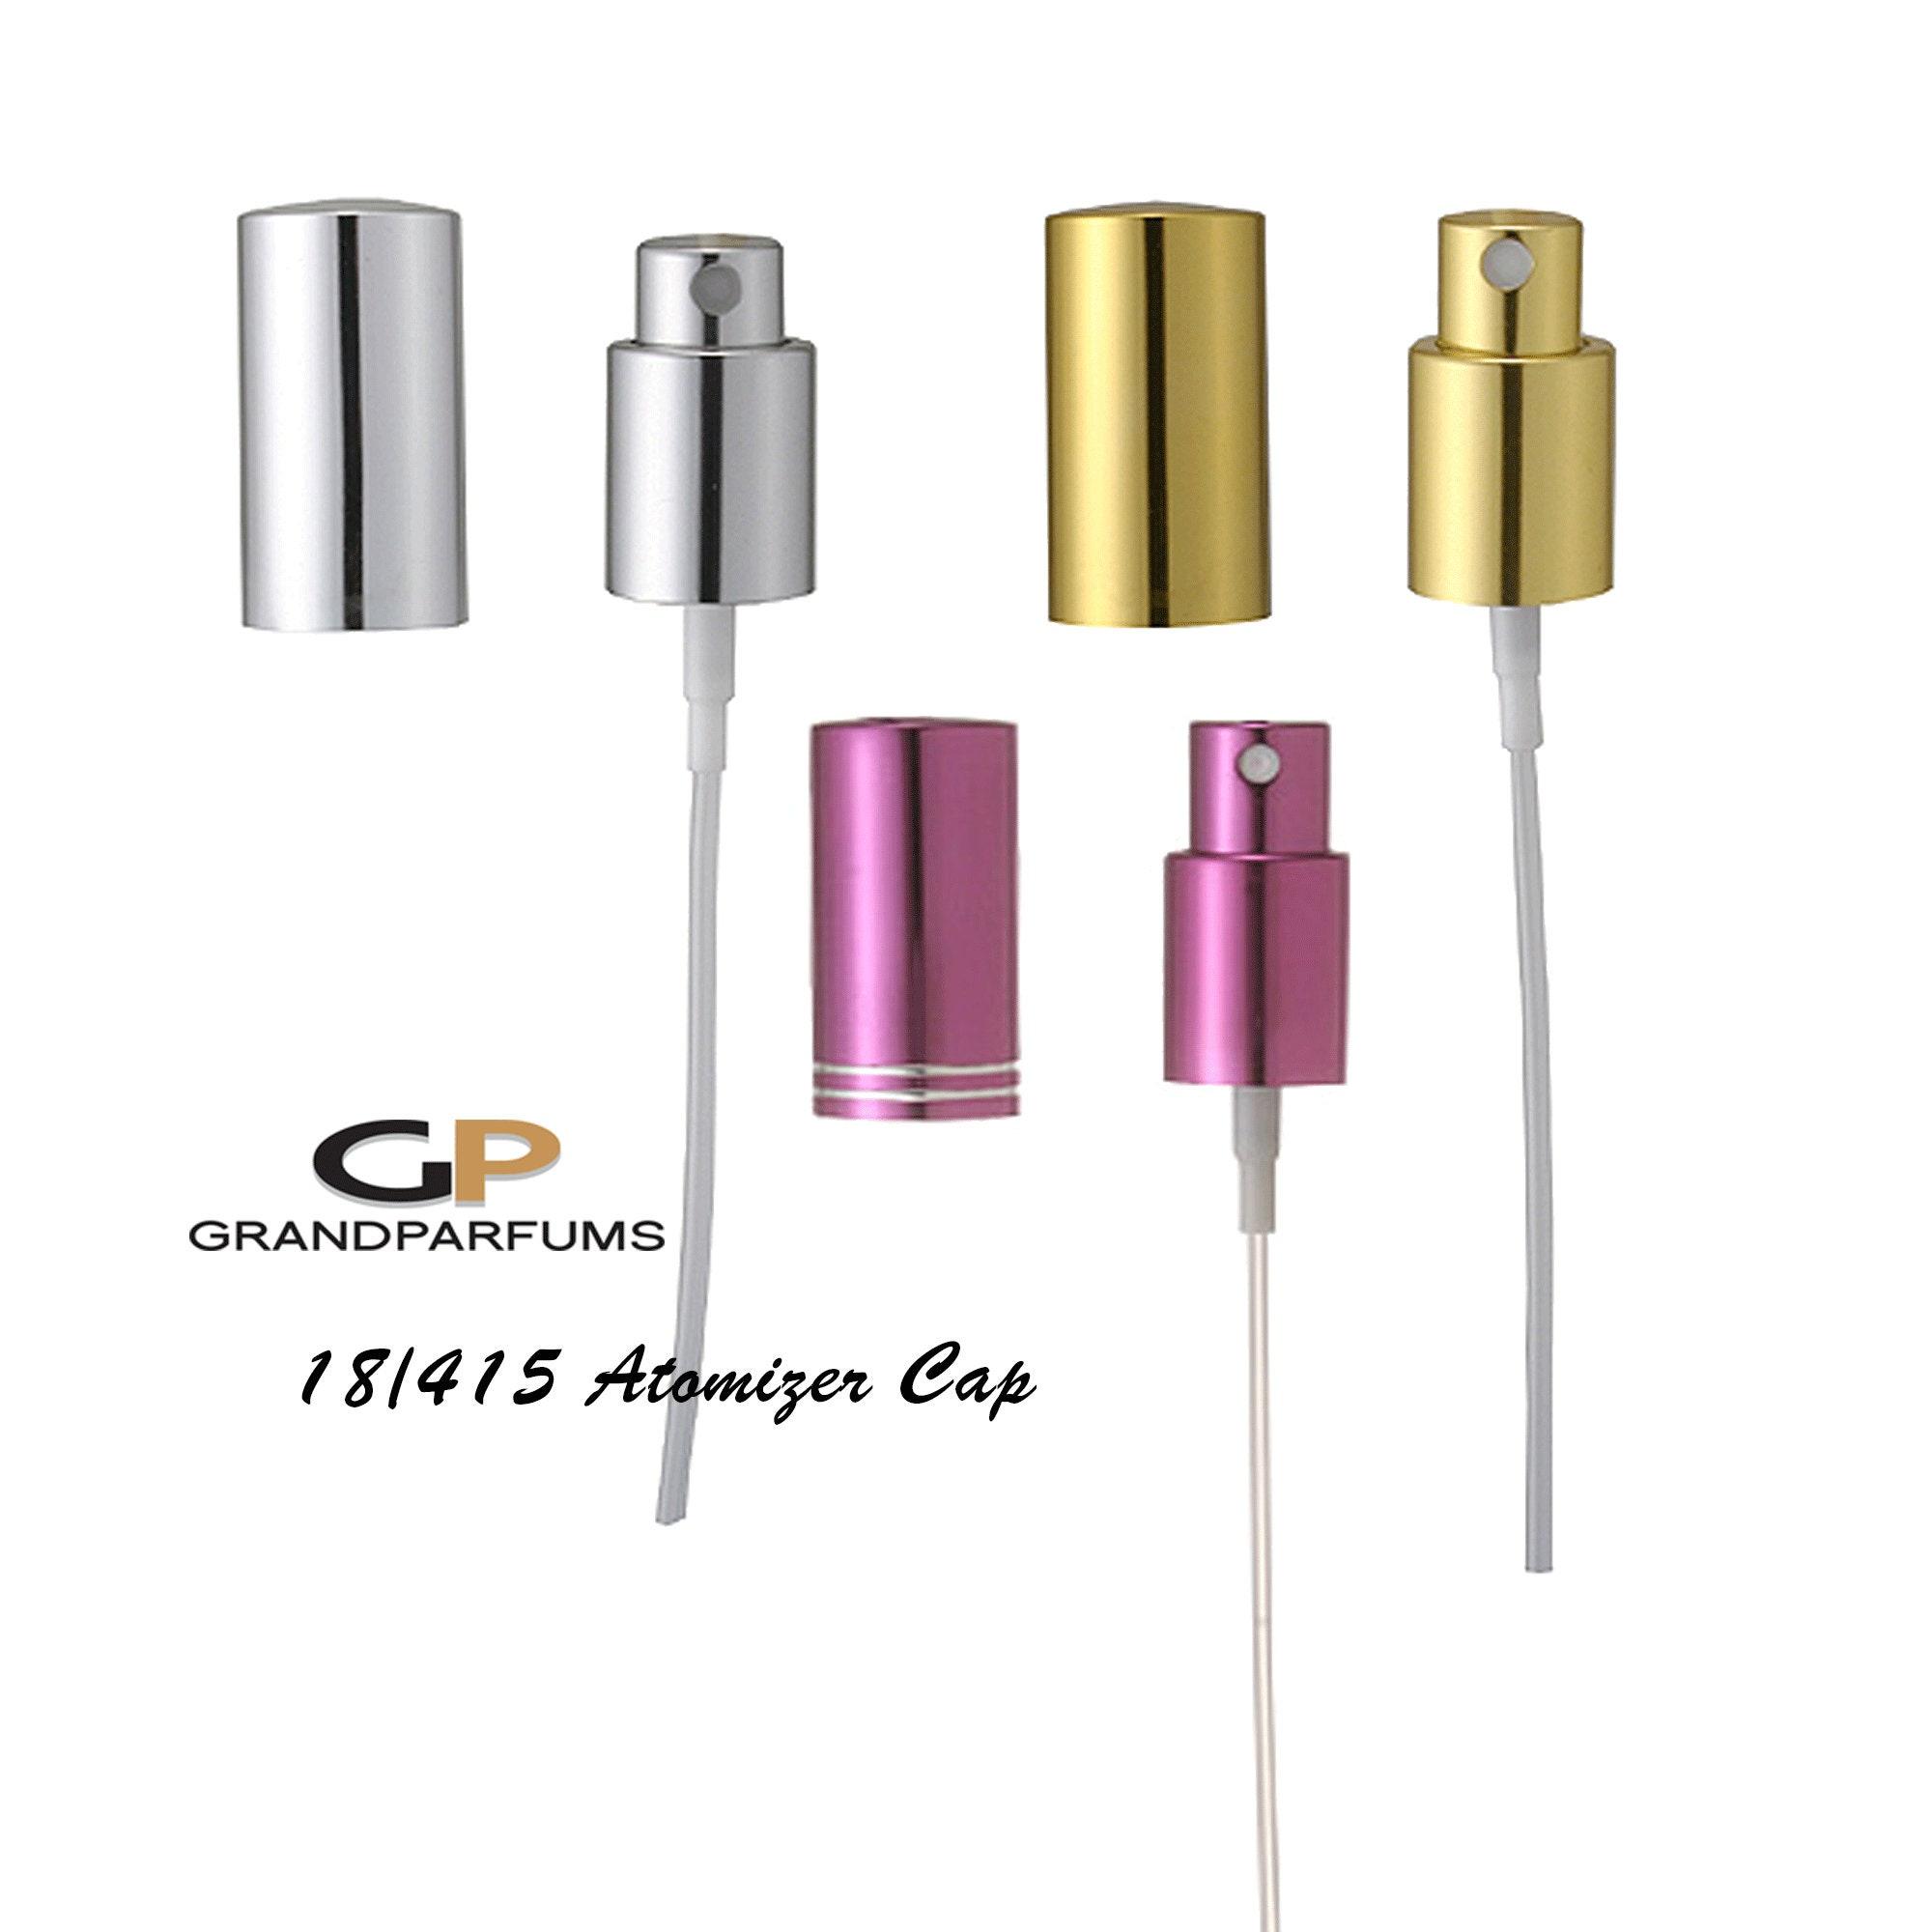 3-12 GOLD or SILVER PERFUME Sprayers Atomizer Caps Aluminum